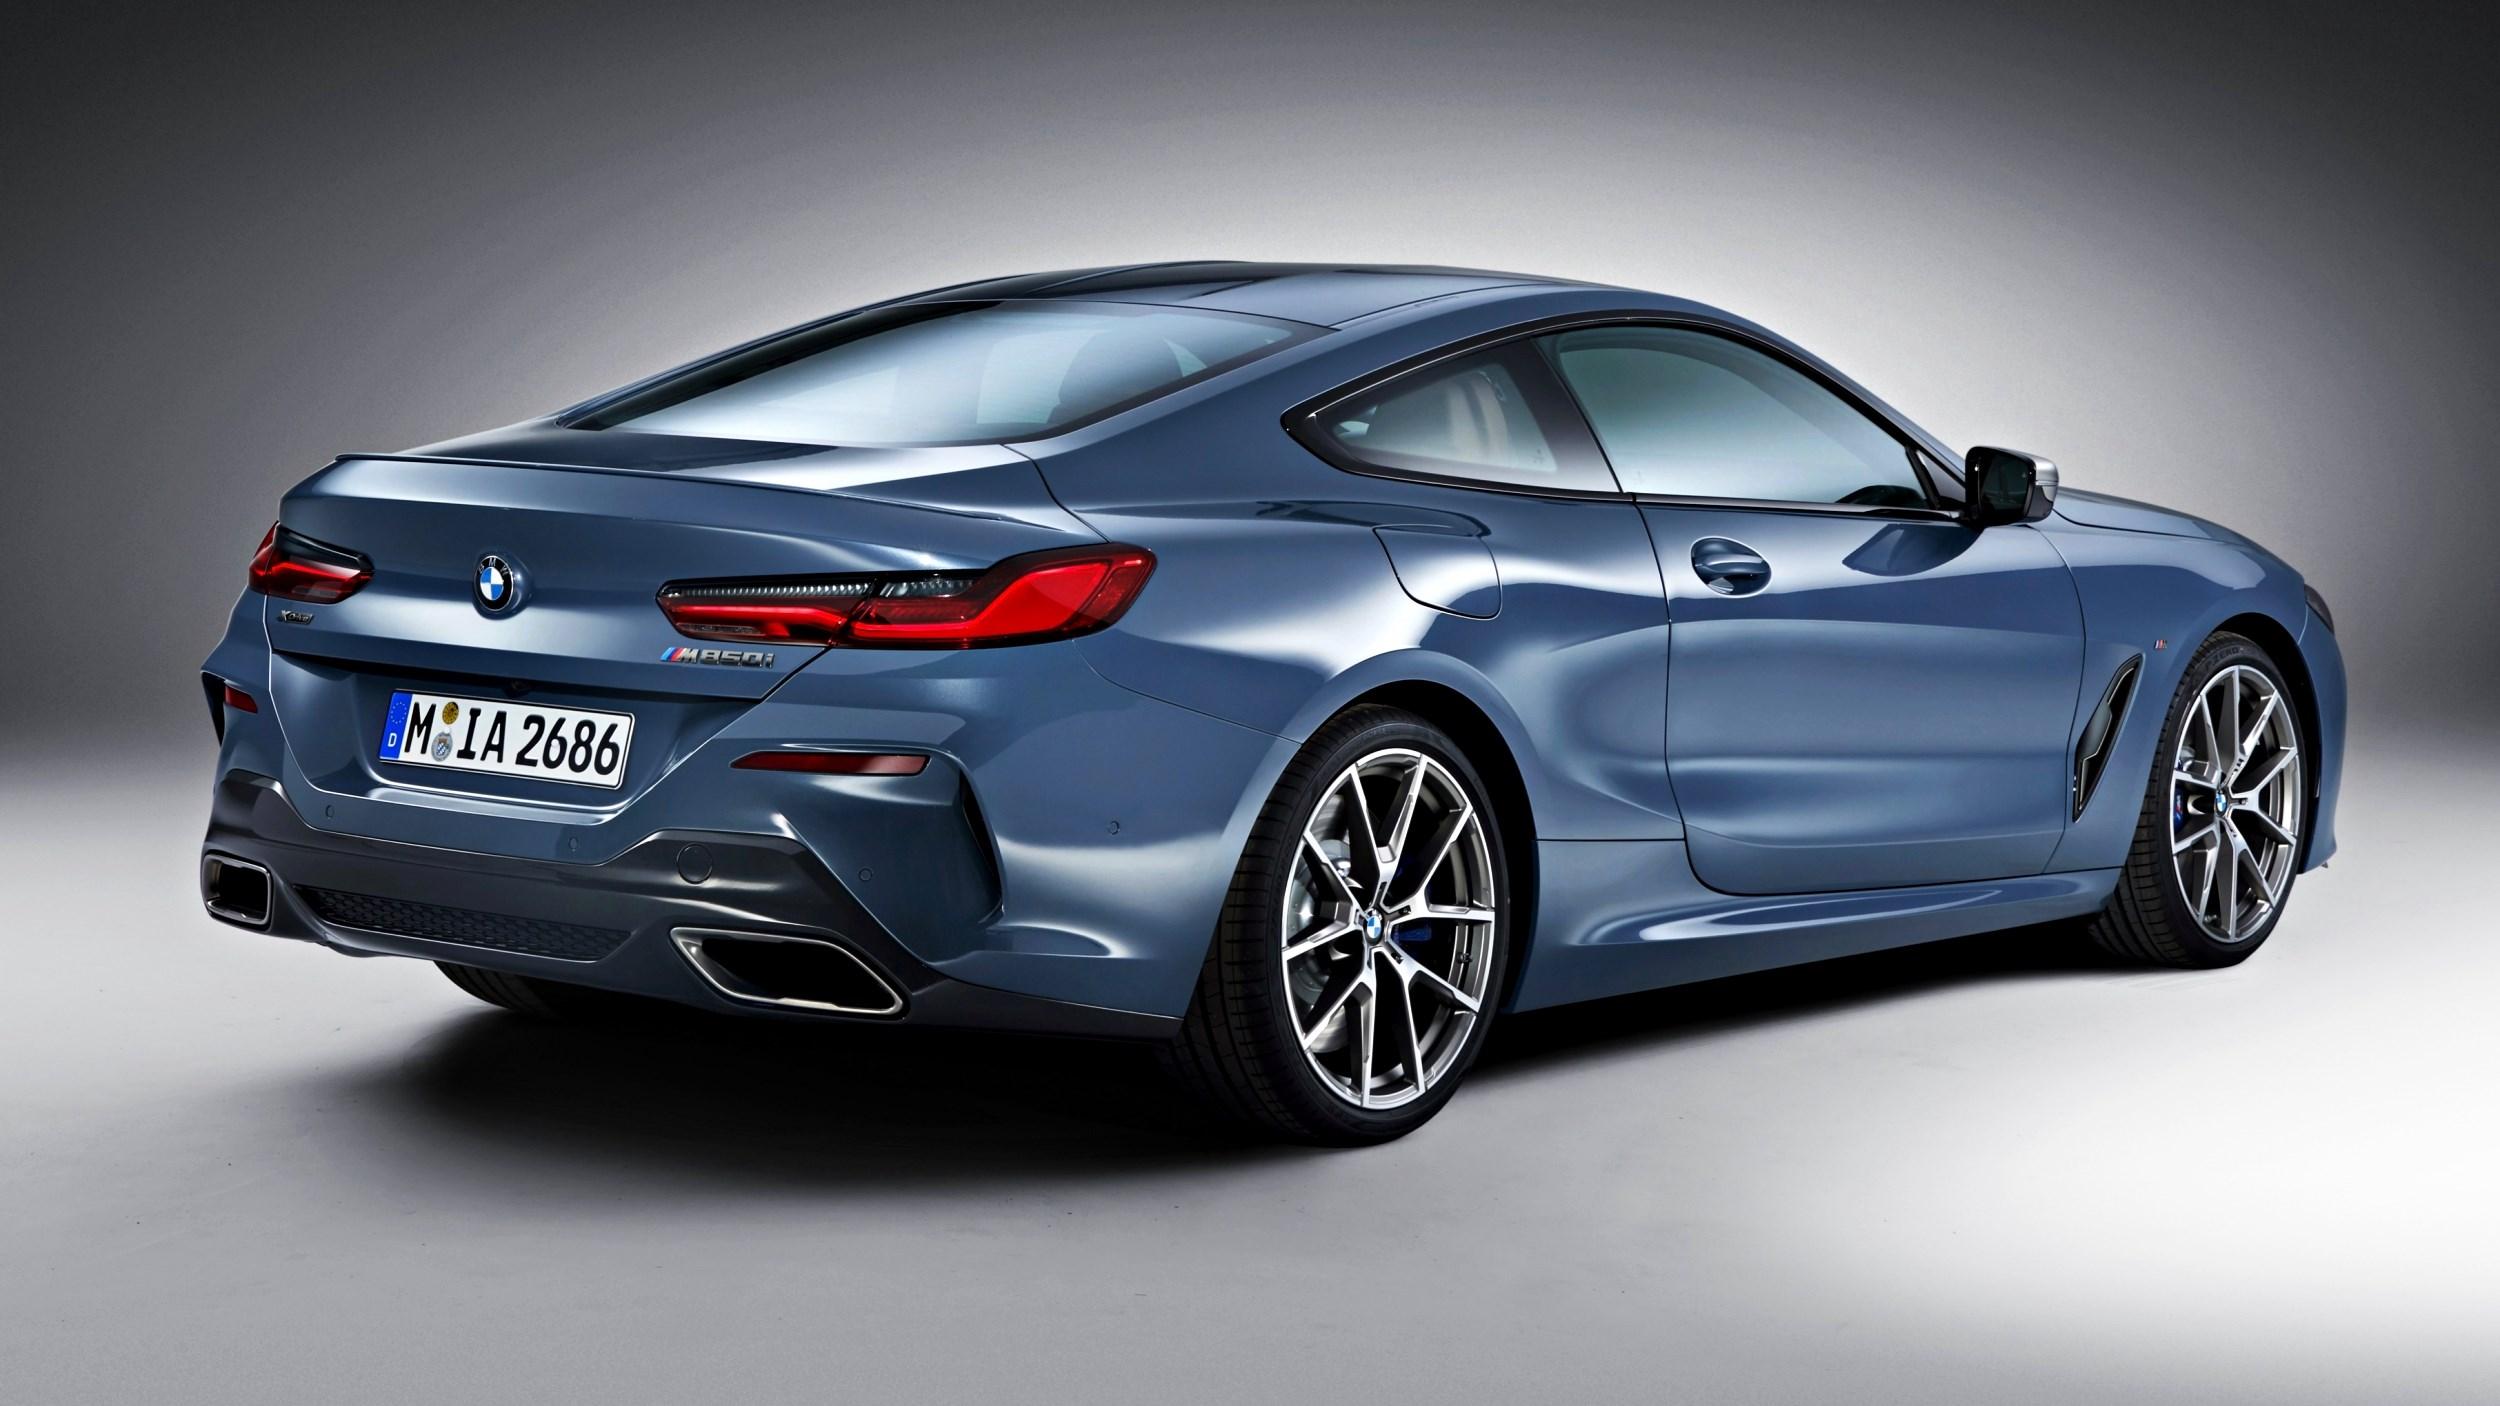 2019 BMW 8-Series Aims To Dominate Thumbnail